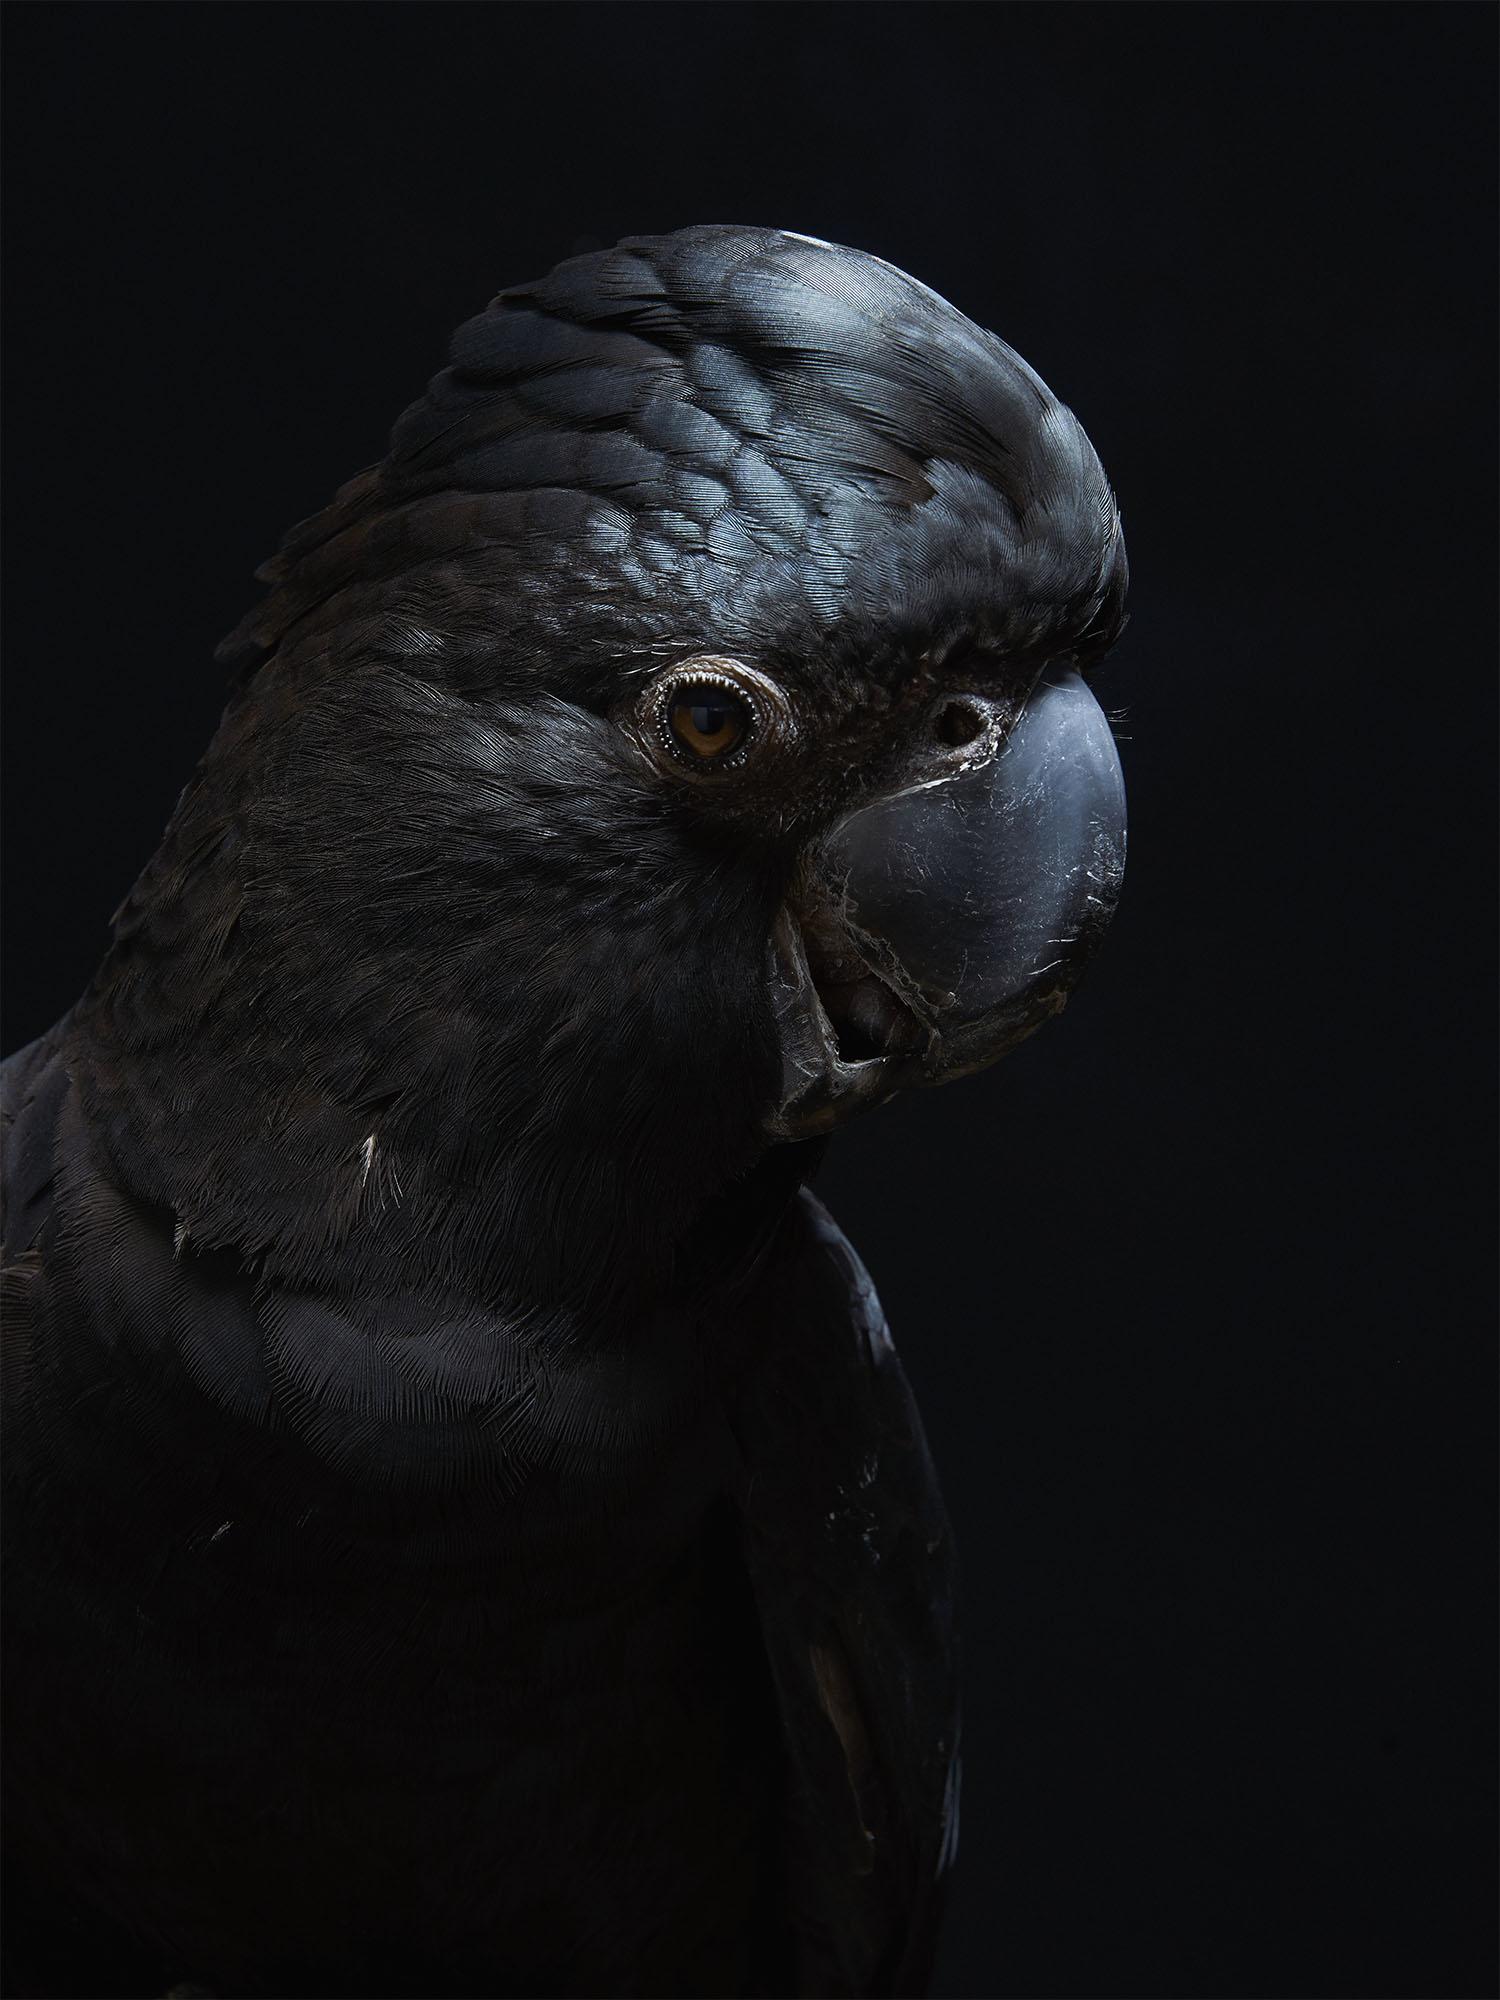 Red-tailed-Black-Cockatoo-Gary-Heery-Bird-Print